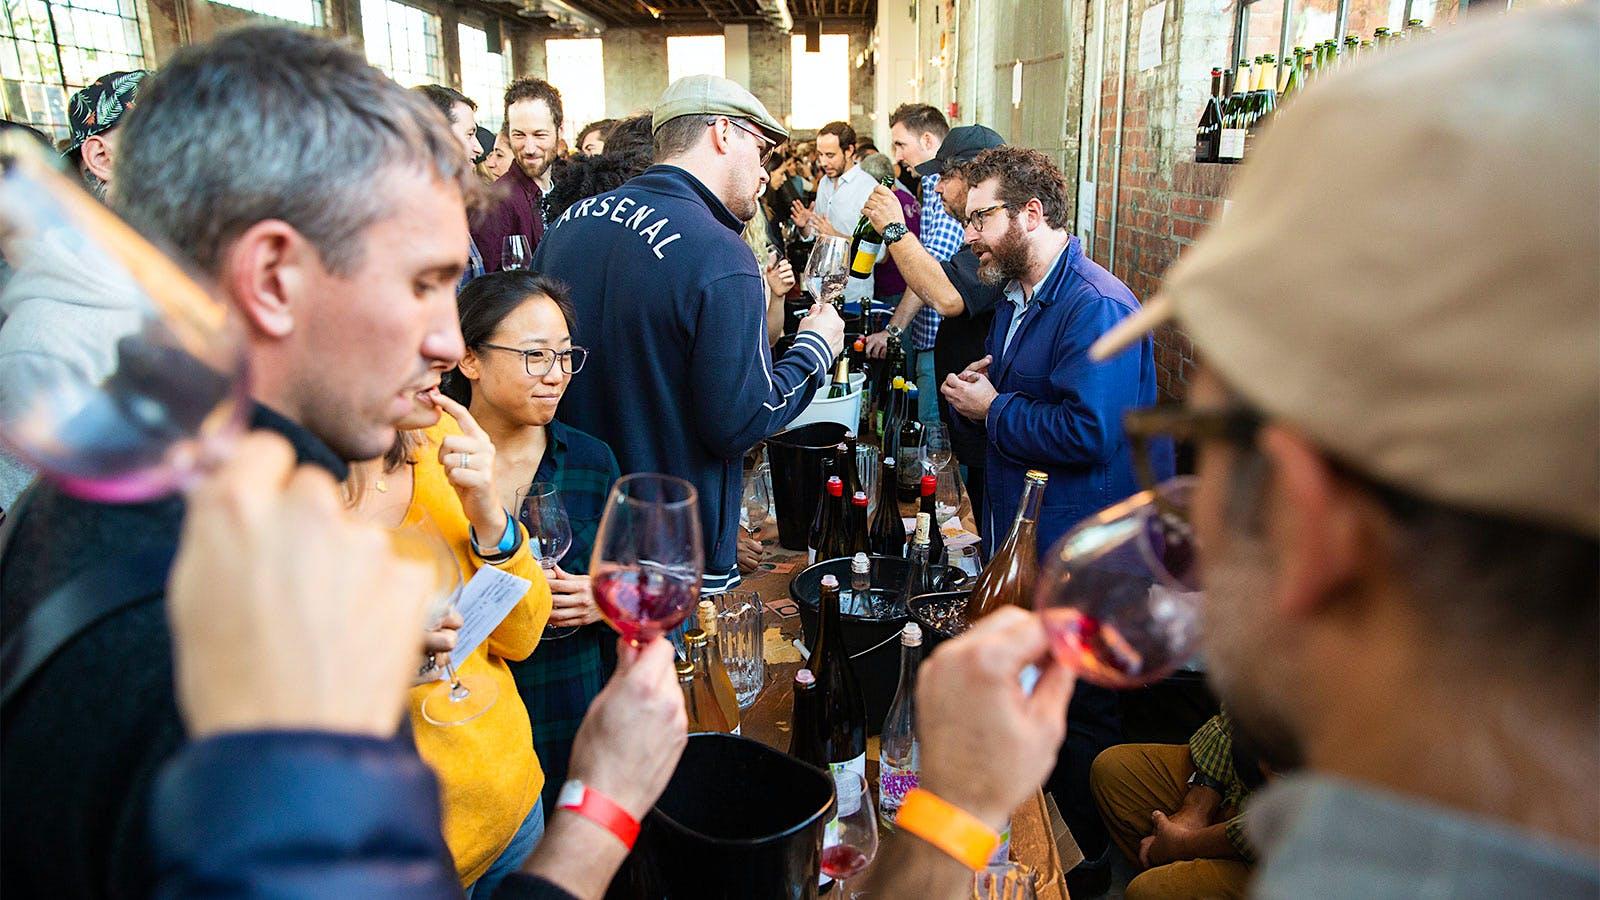 A Celebration of Natural Wine